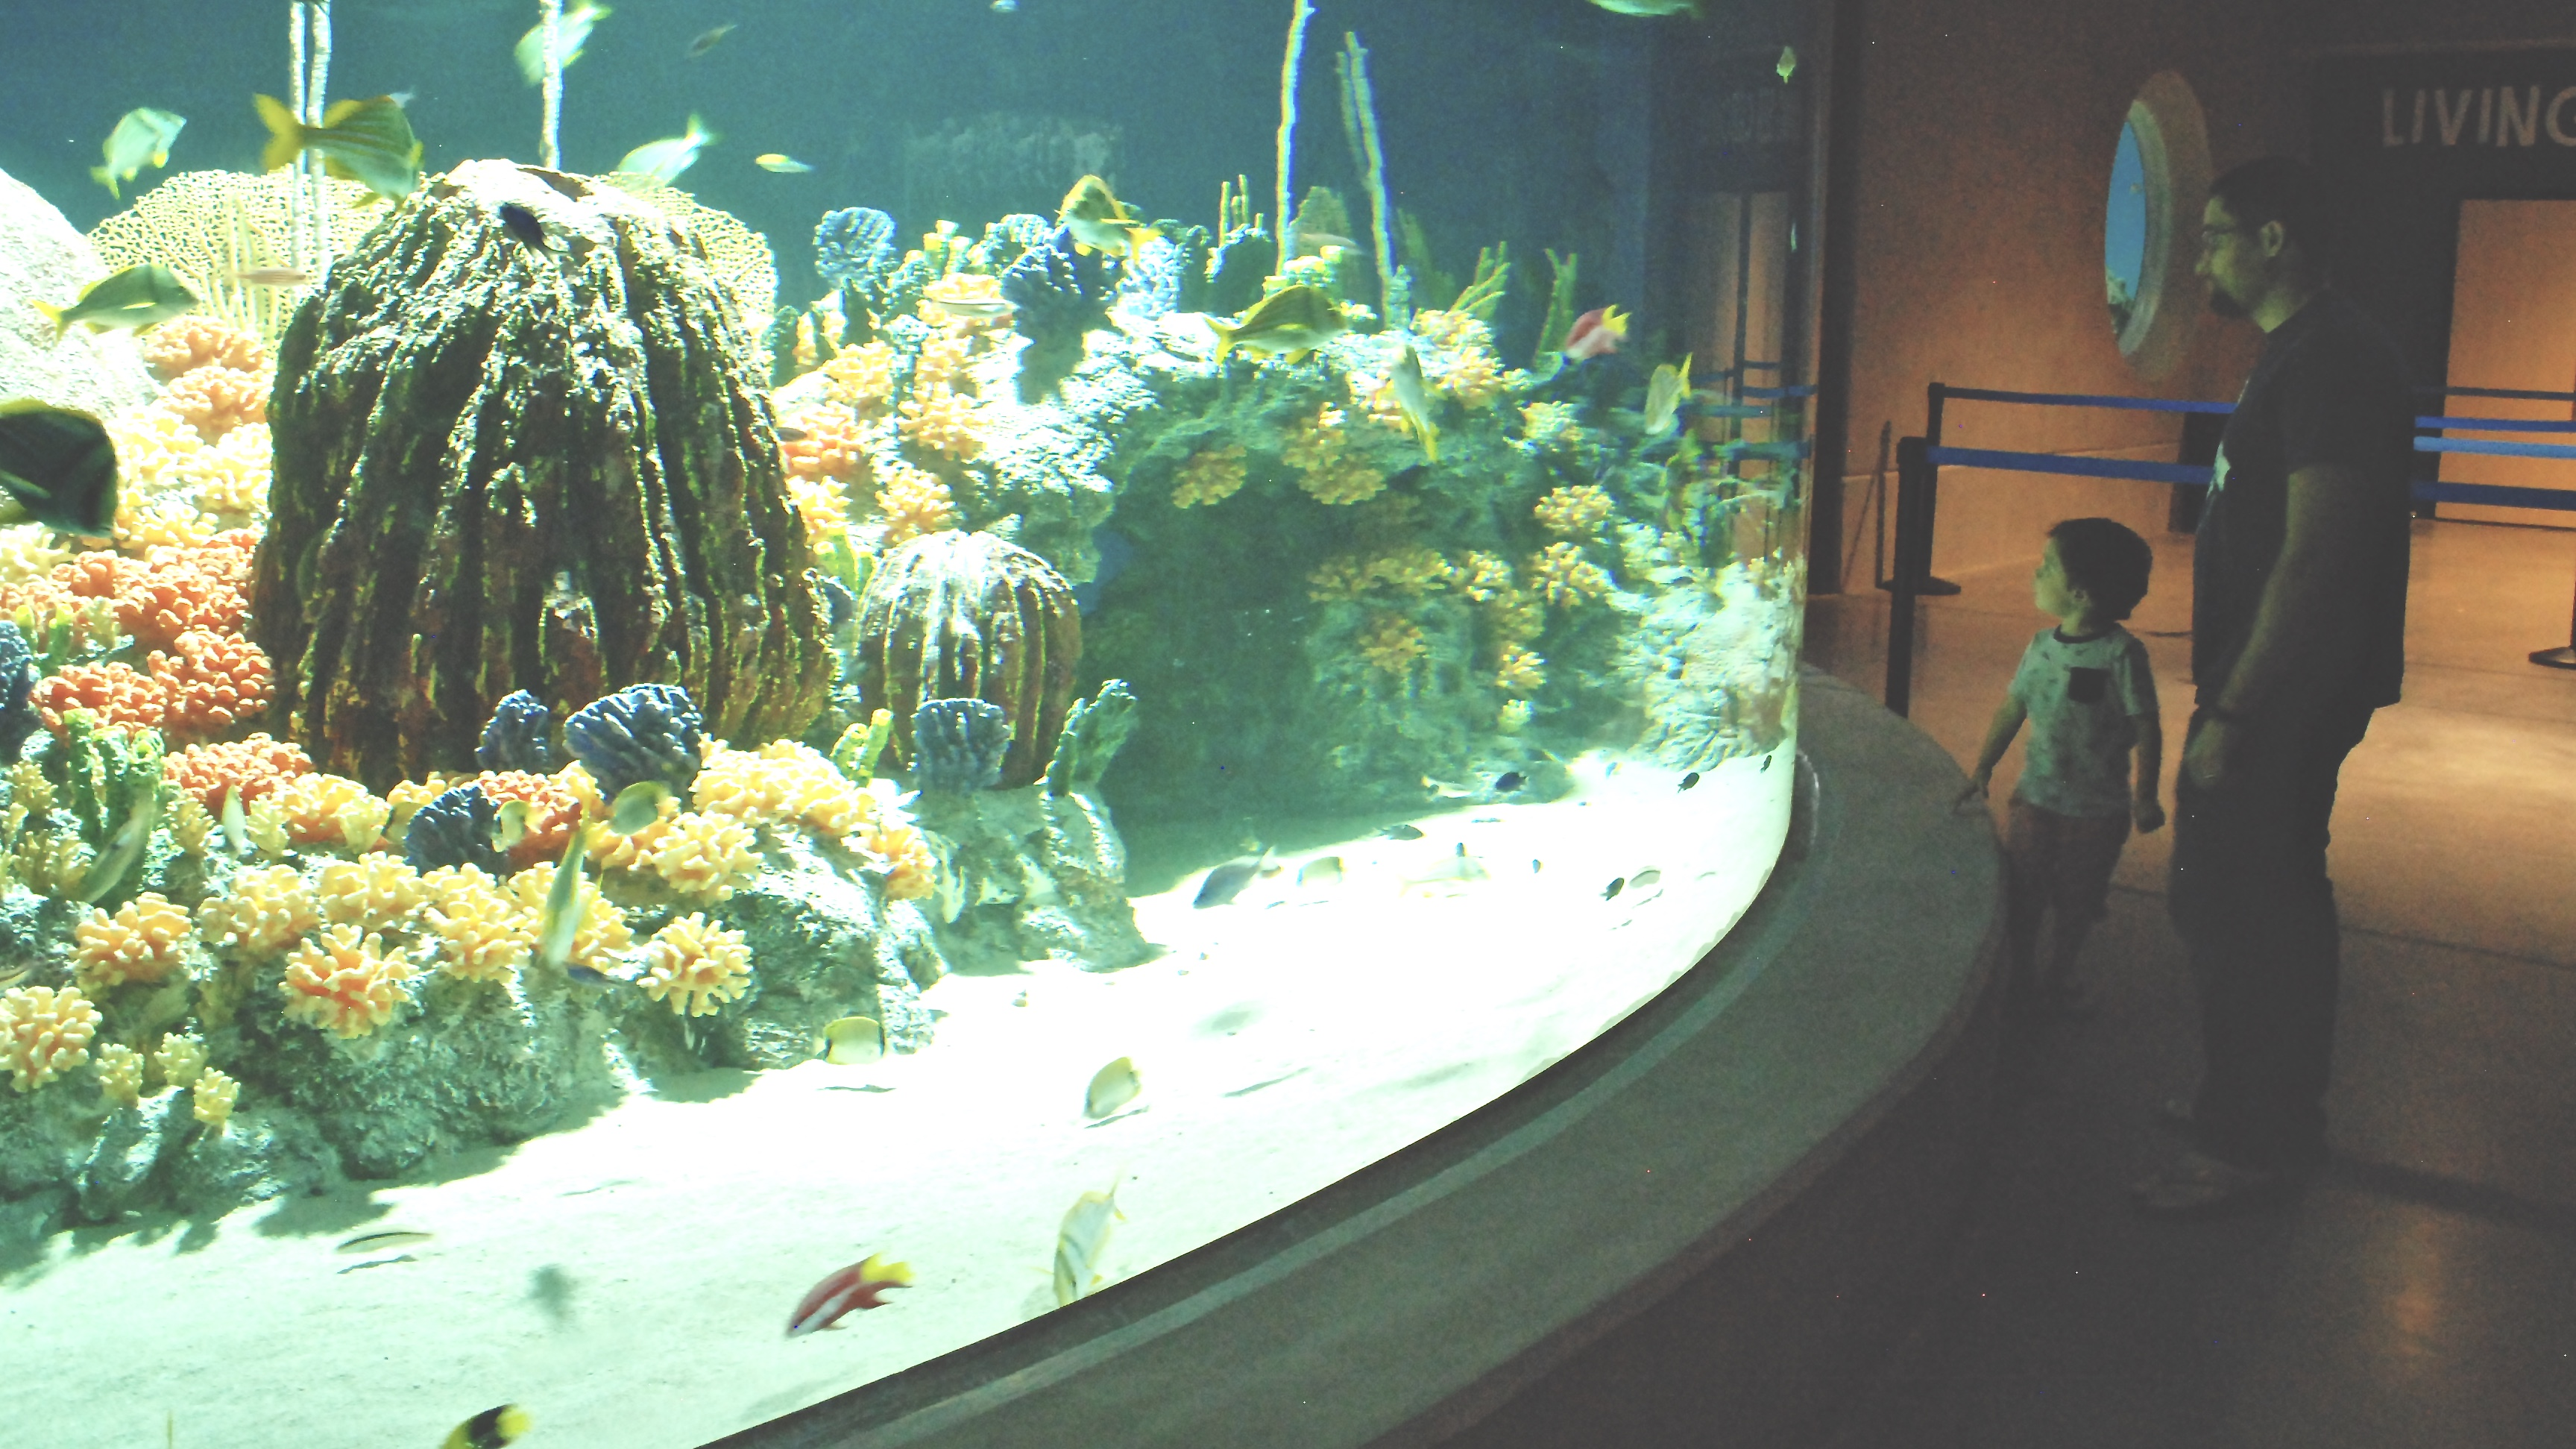 Reasons to Love the Odysea Aquarium